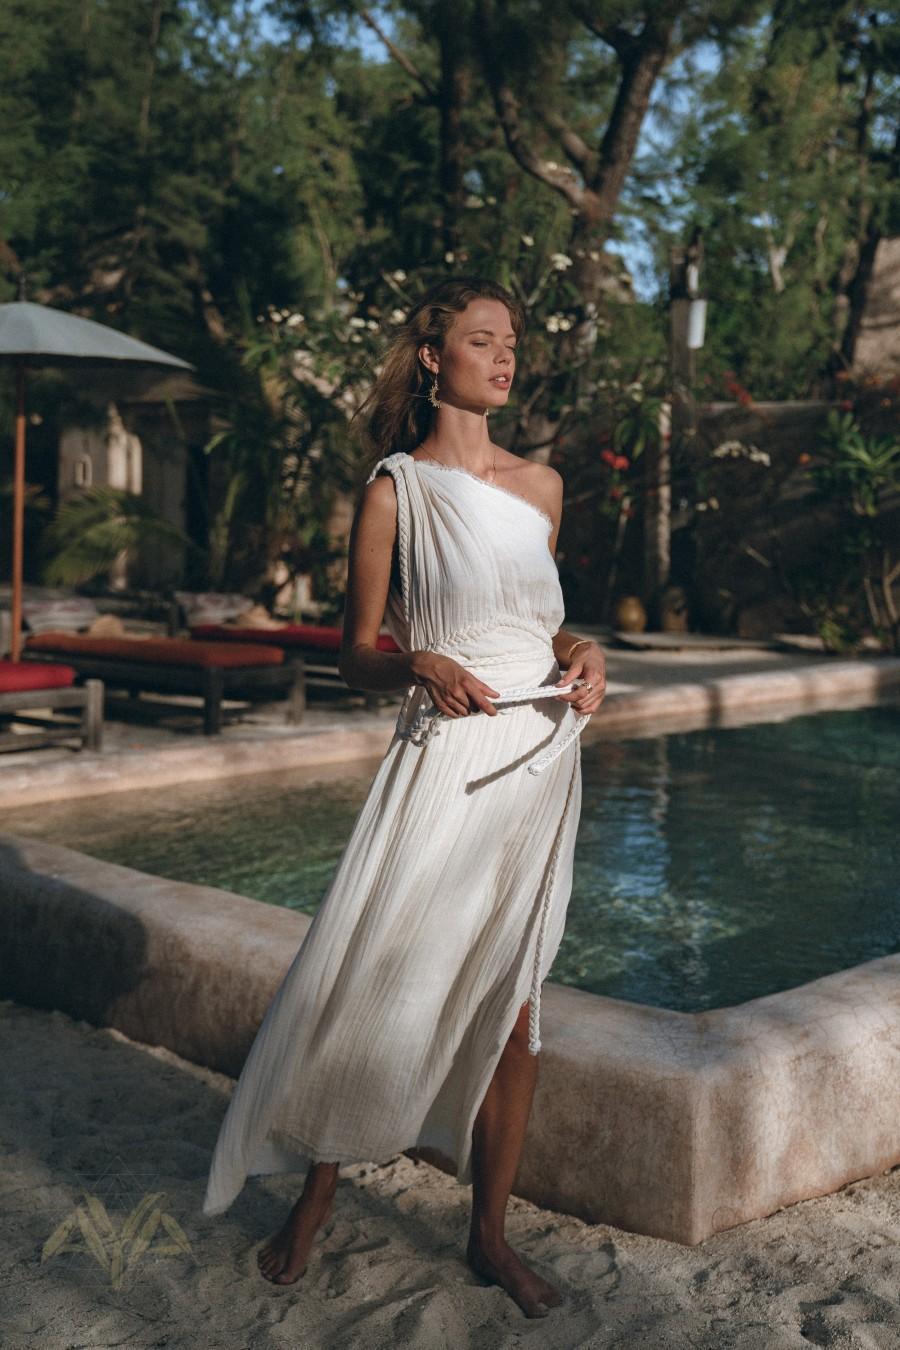 Hochzeit - Greek Goddess Wedding Dress • Boho Bohemian Dress • Organic Cotton Bridesmaid Dress • Maxi One Shoulder Dress  • Off White Long Toga Dress